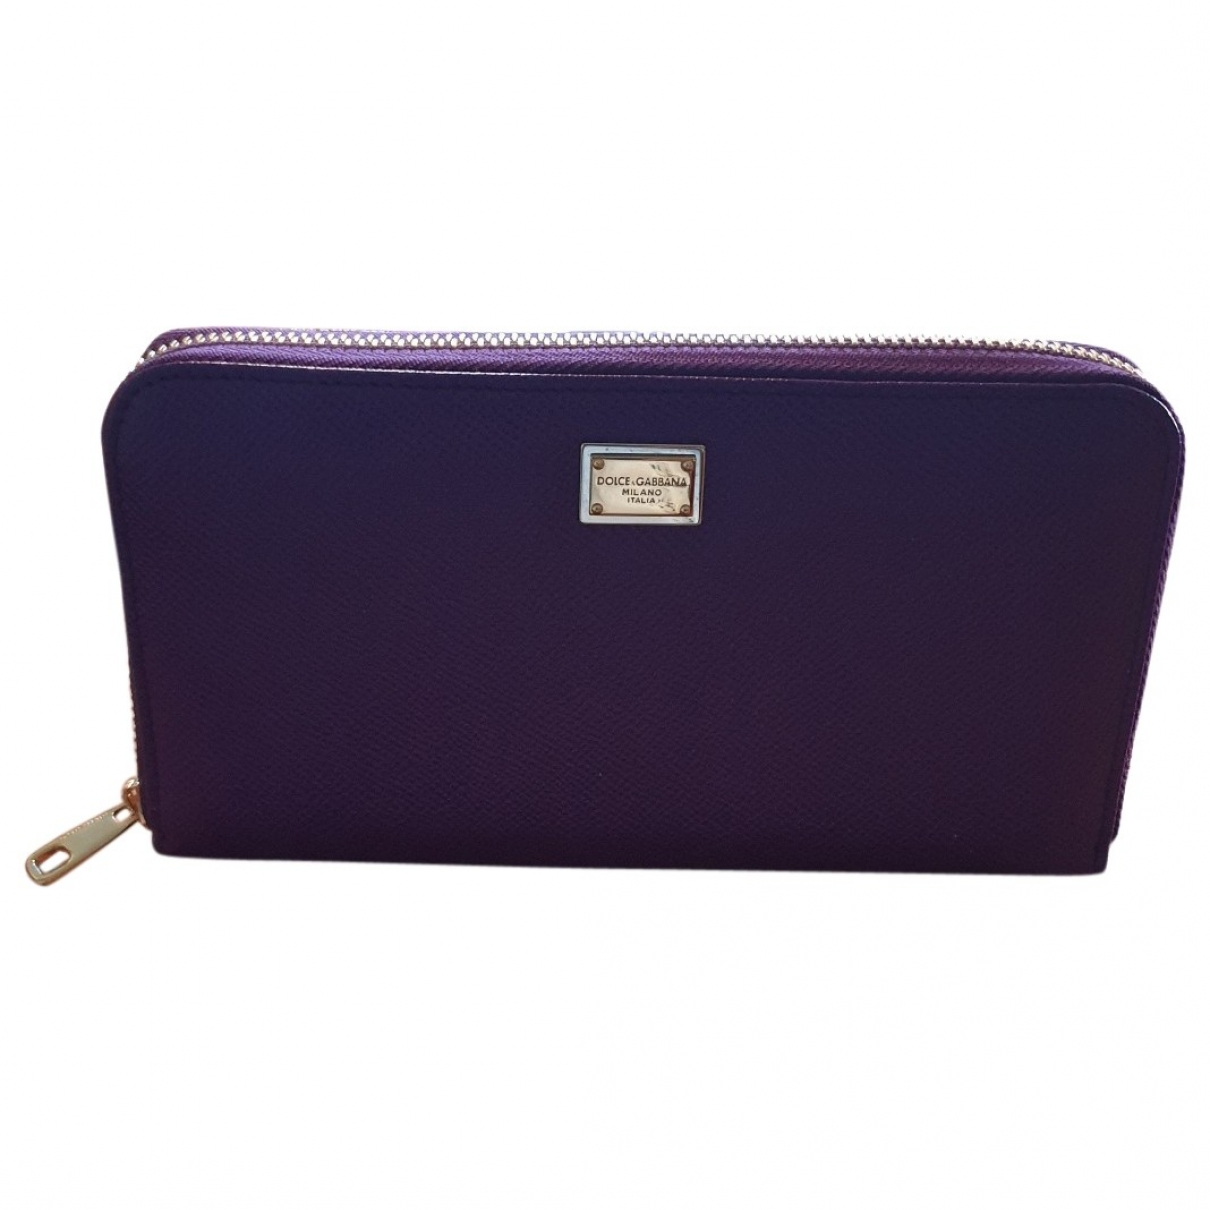 Dolce & Gabbana \N Portemonnaie in  Lila Leder